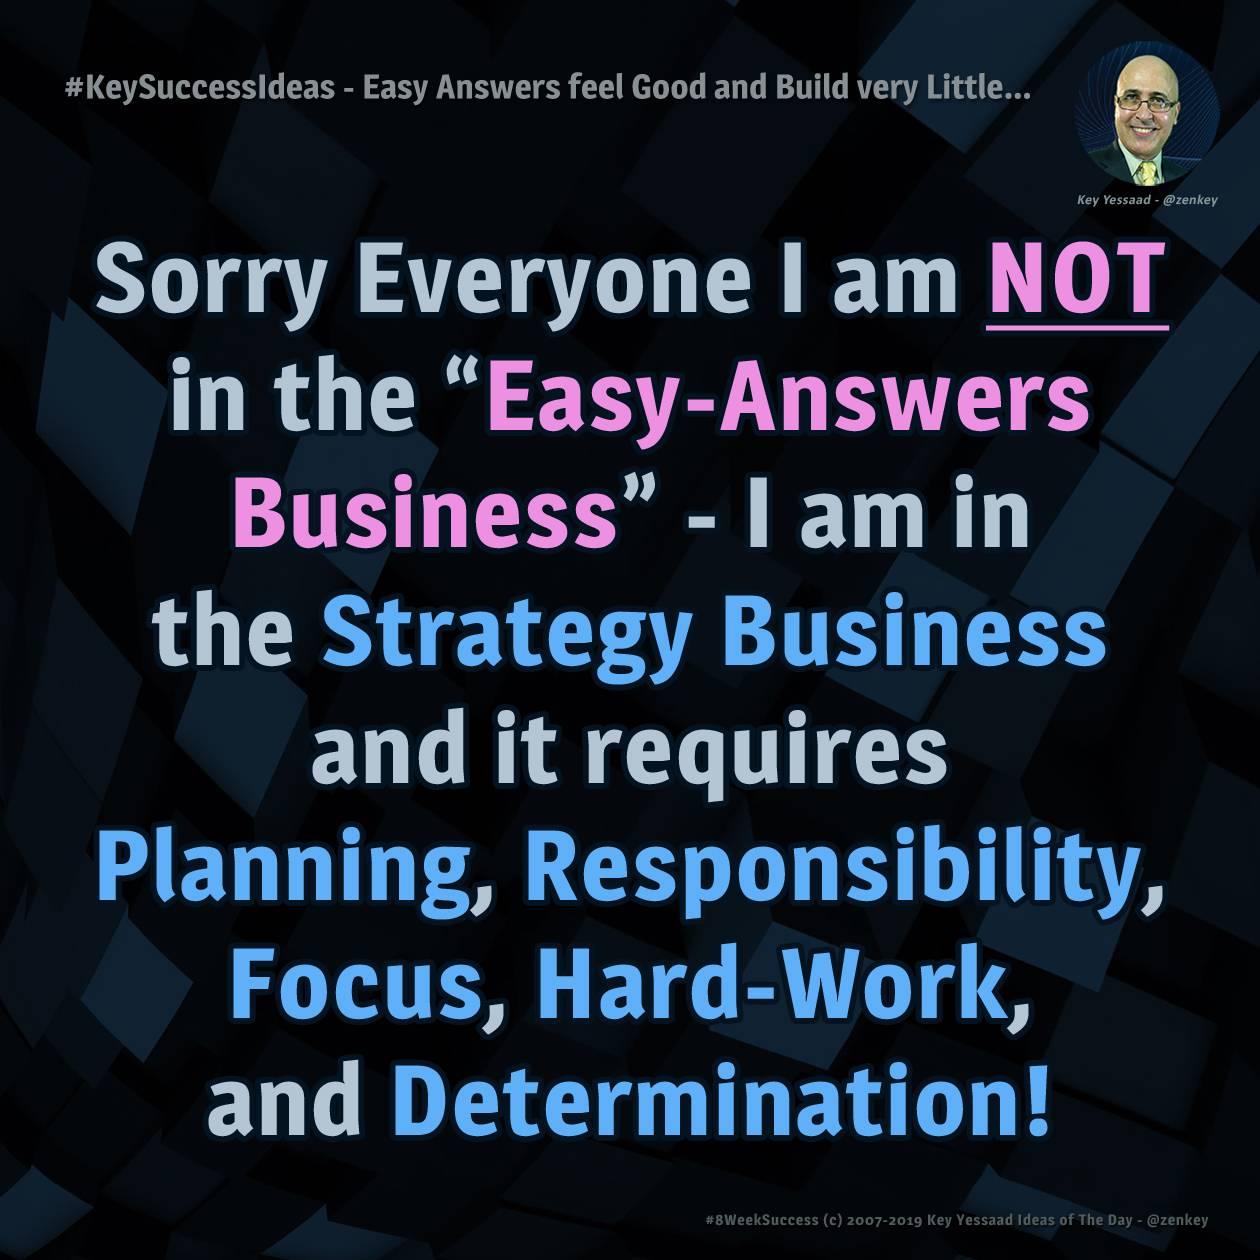 #KeySuccessIdeas - Easy Answers feel Good and Build very Little...